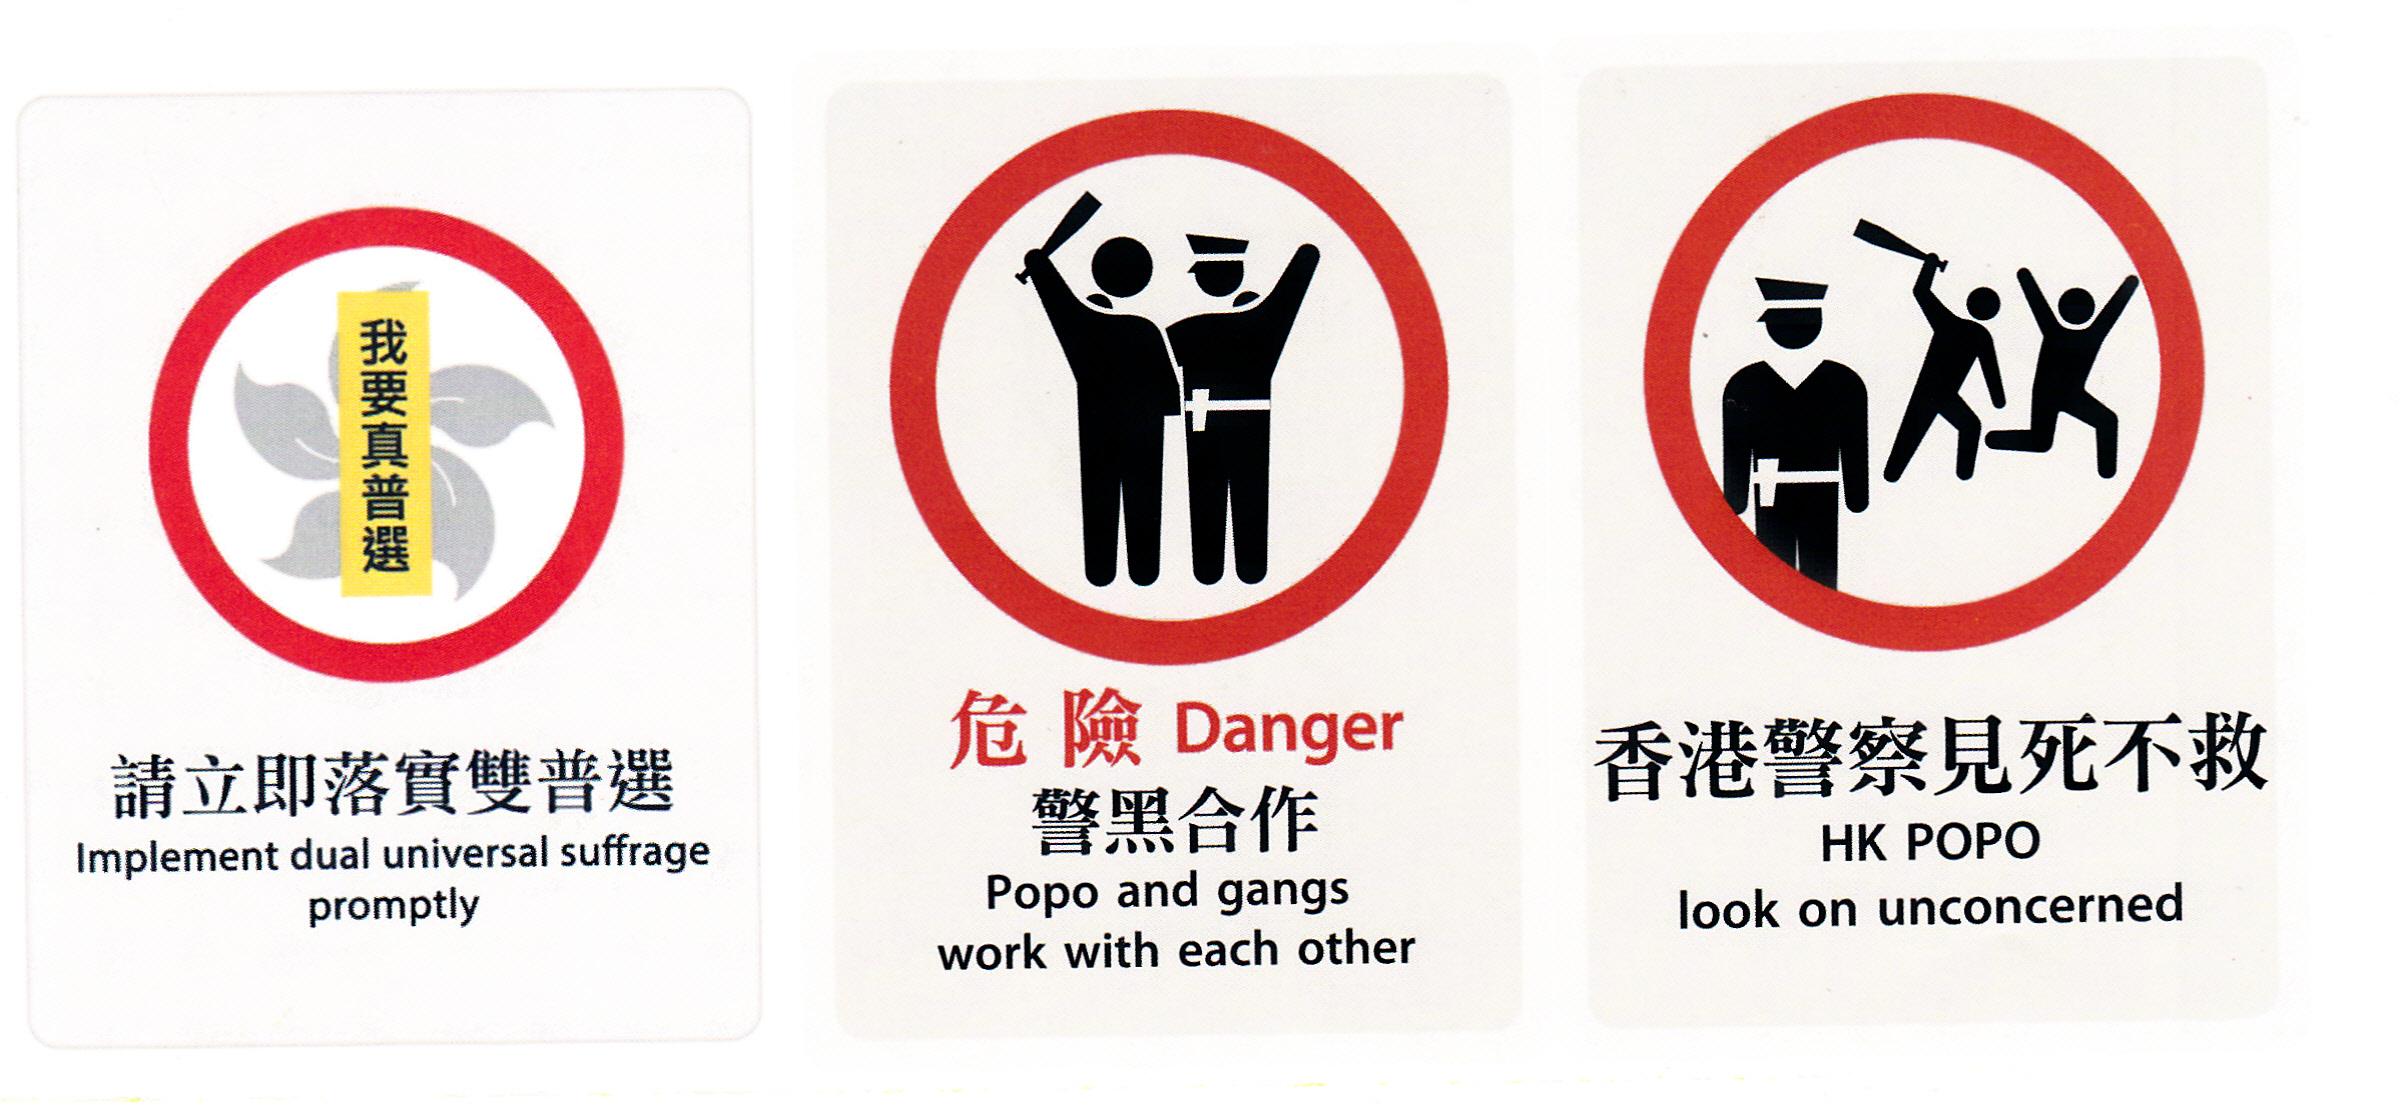 Hongkongers_five_demands_2019_0001